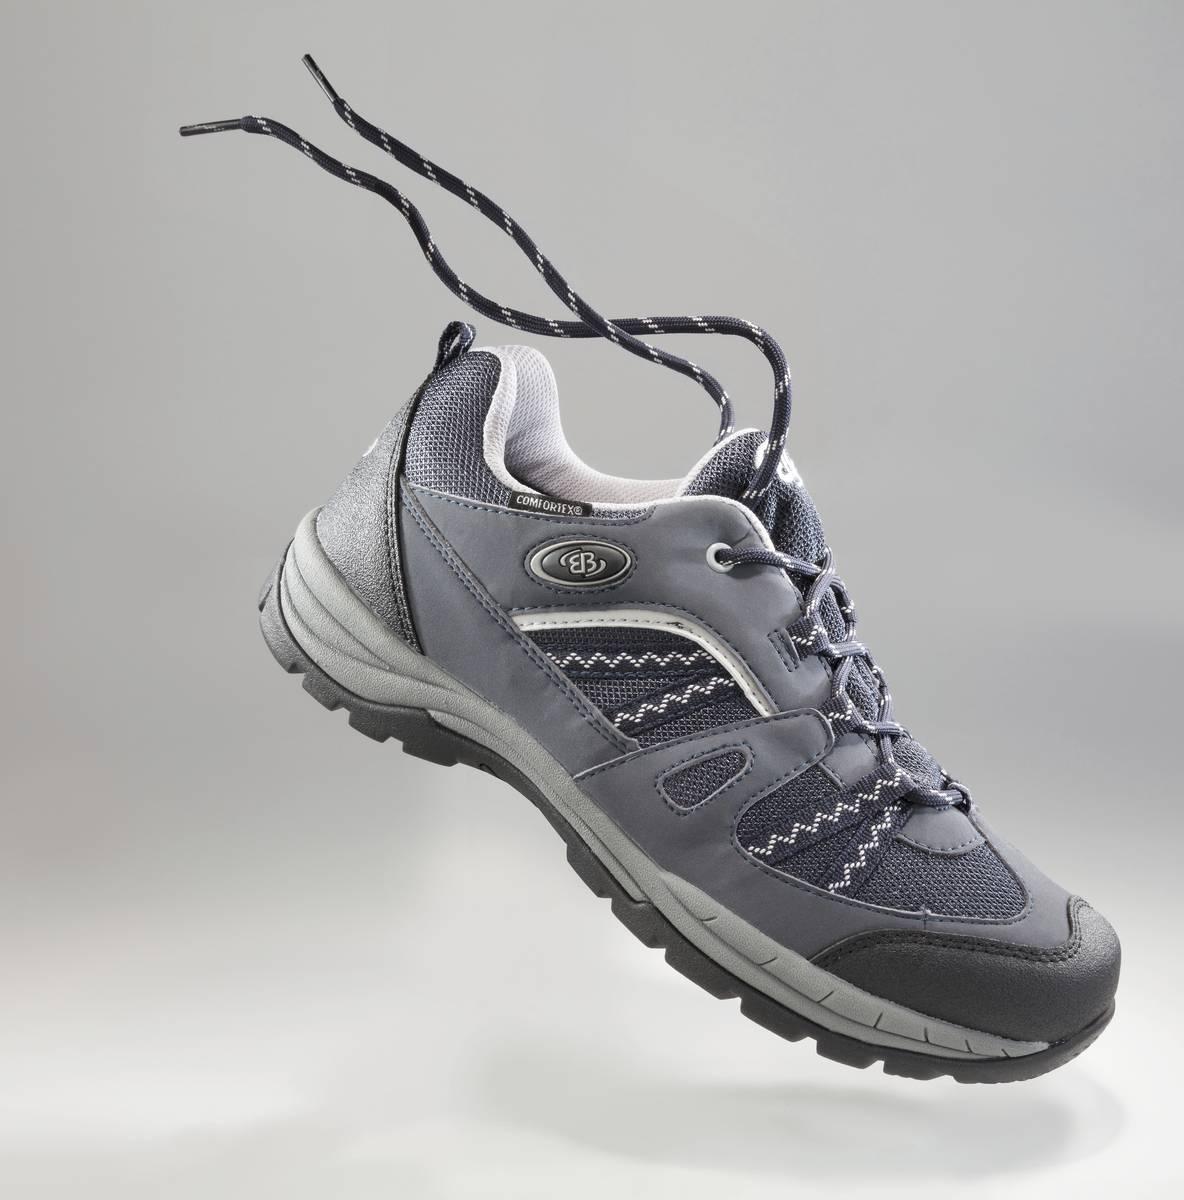 sports shoes 16152 9d888 EB Brütting Outdoorschuh mit auswechselbarer Innensohle, Farbe marine/grau  Gr. 46